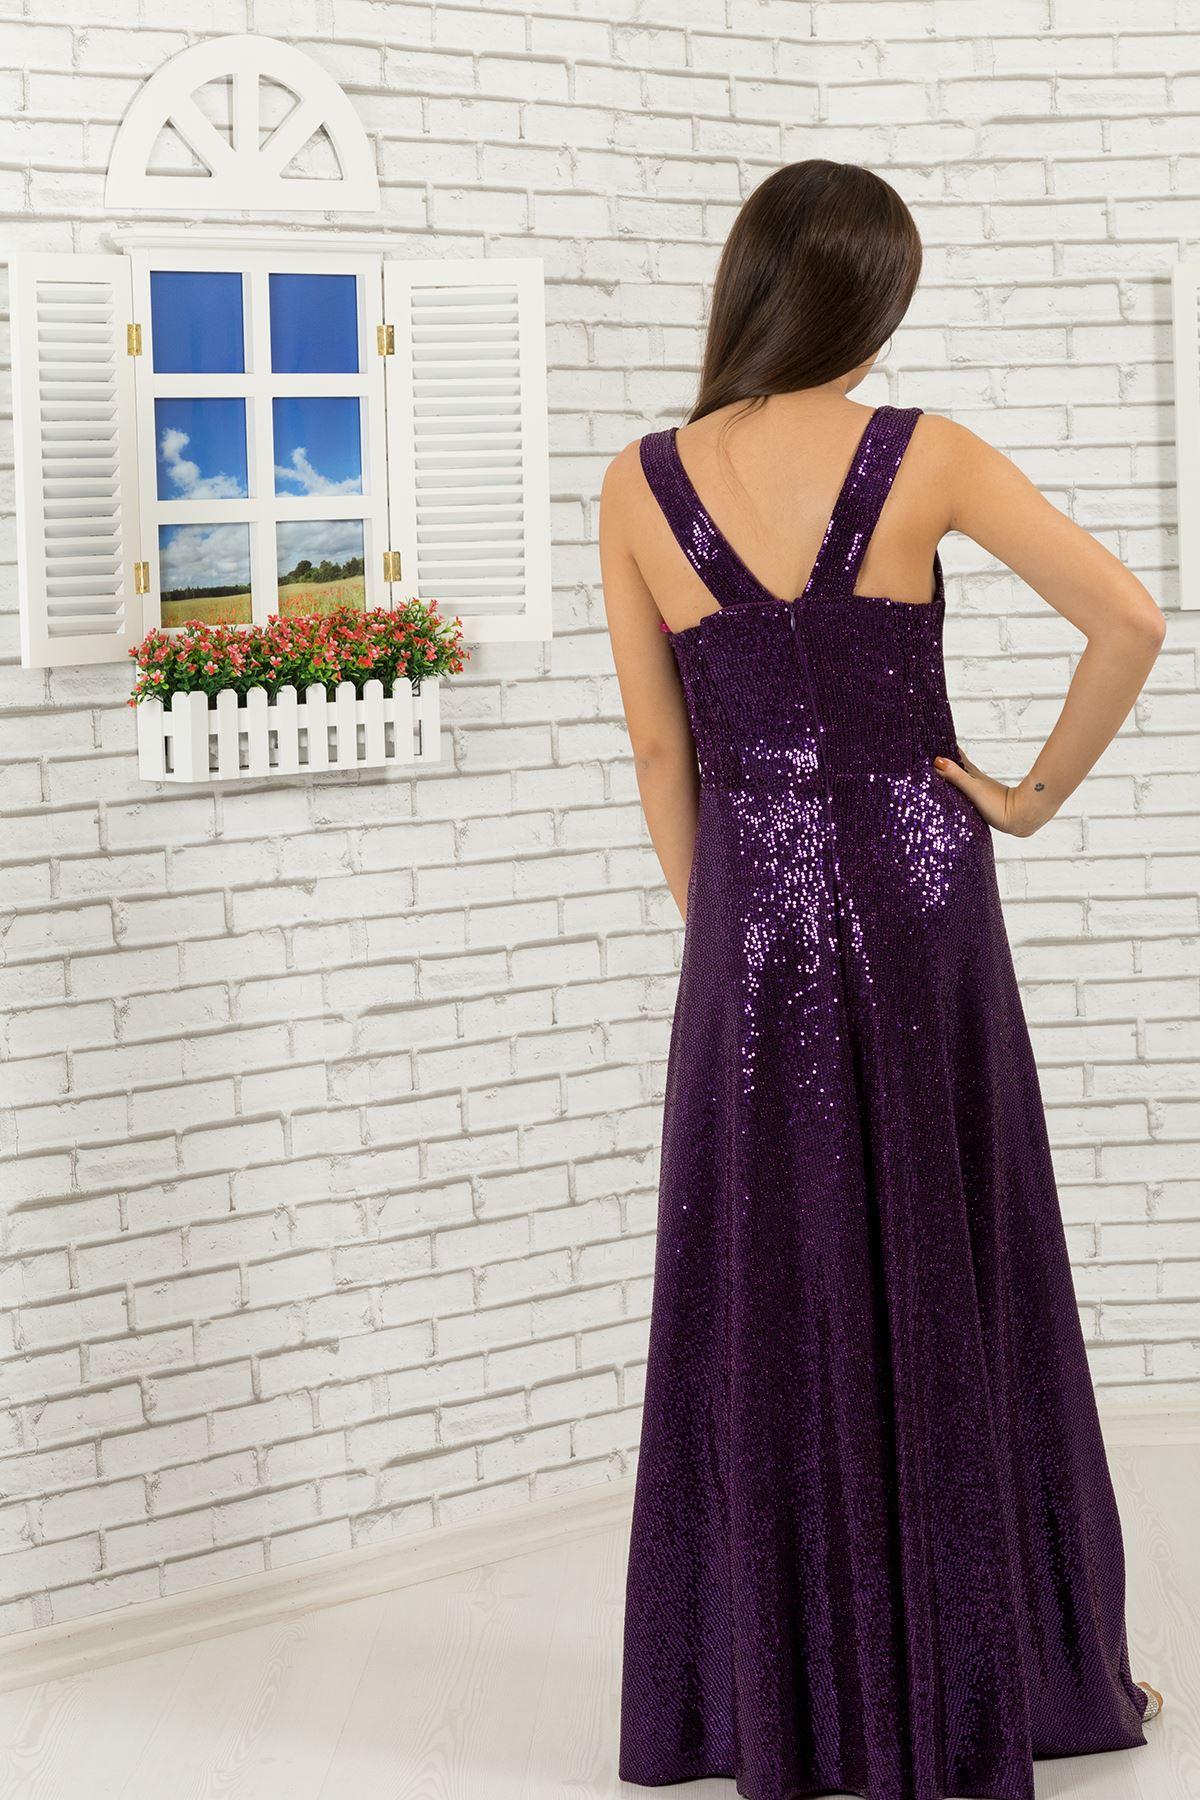 Sequin Tissu Fille Robe 477 Violet